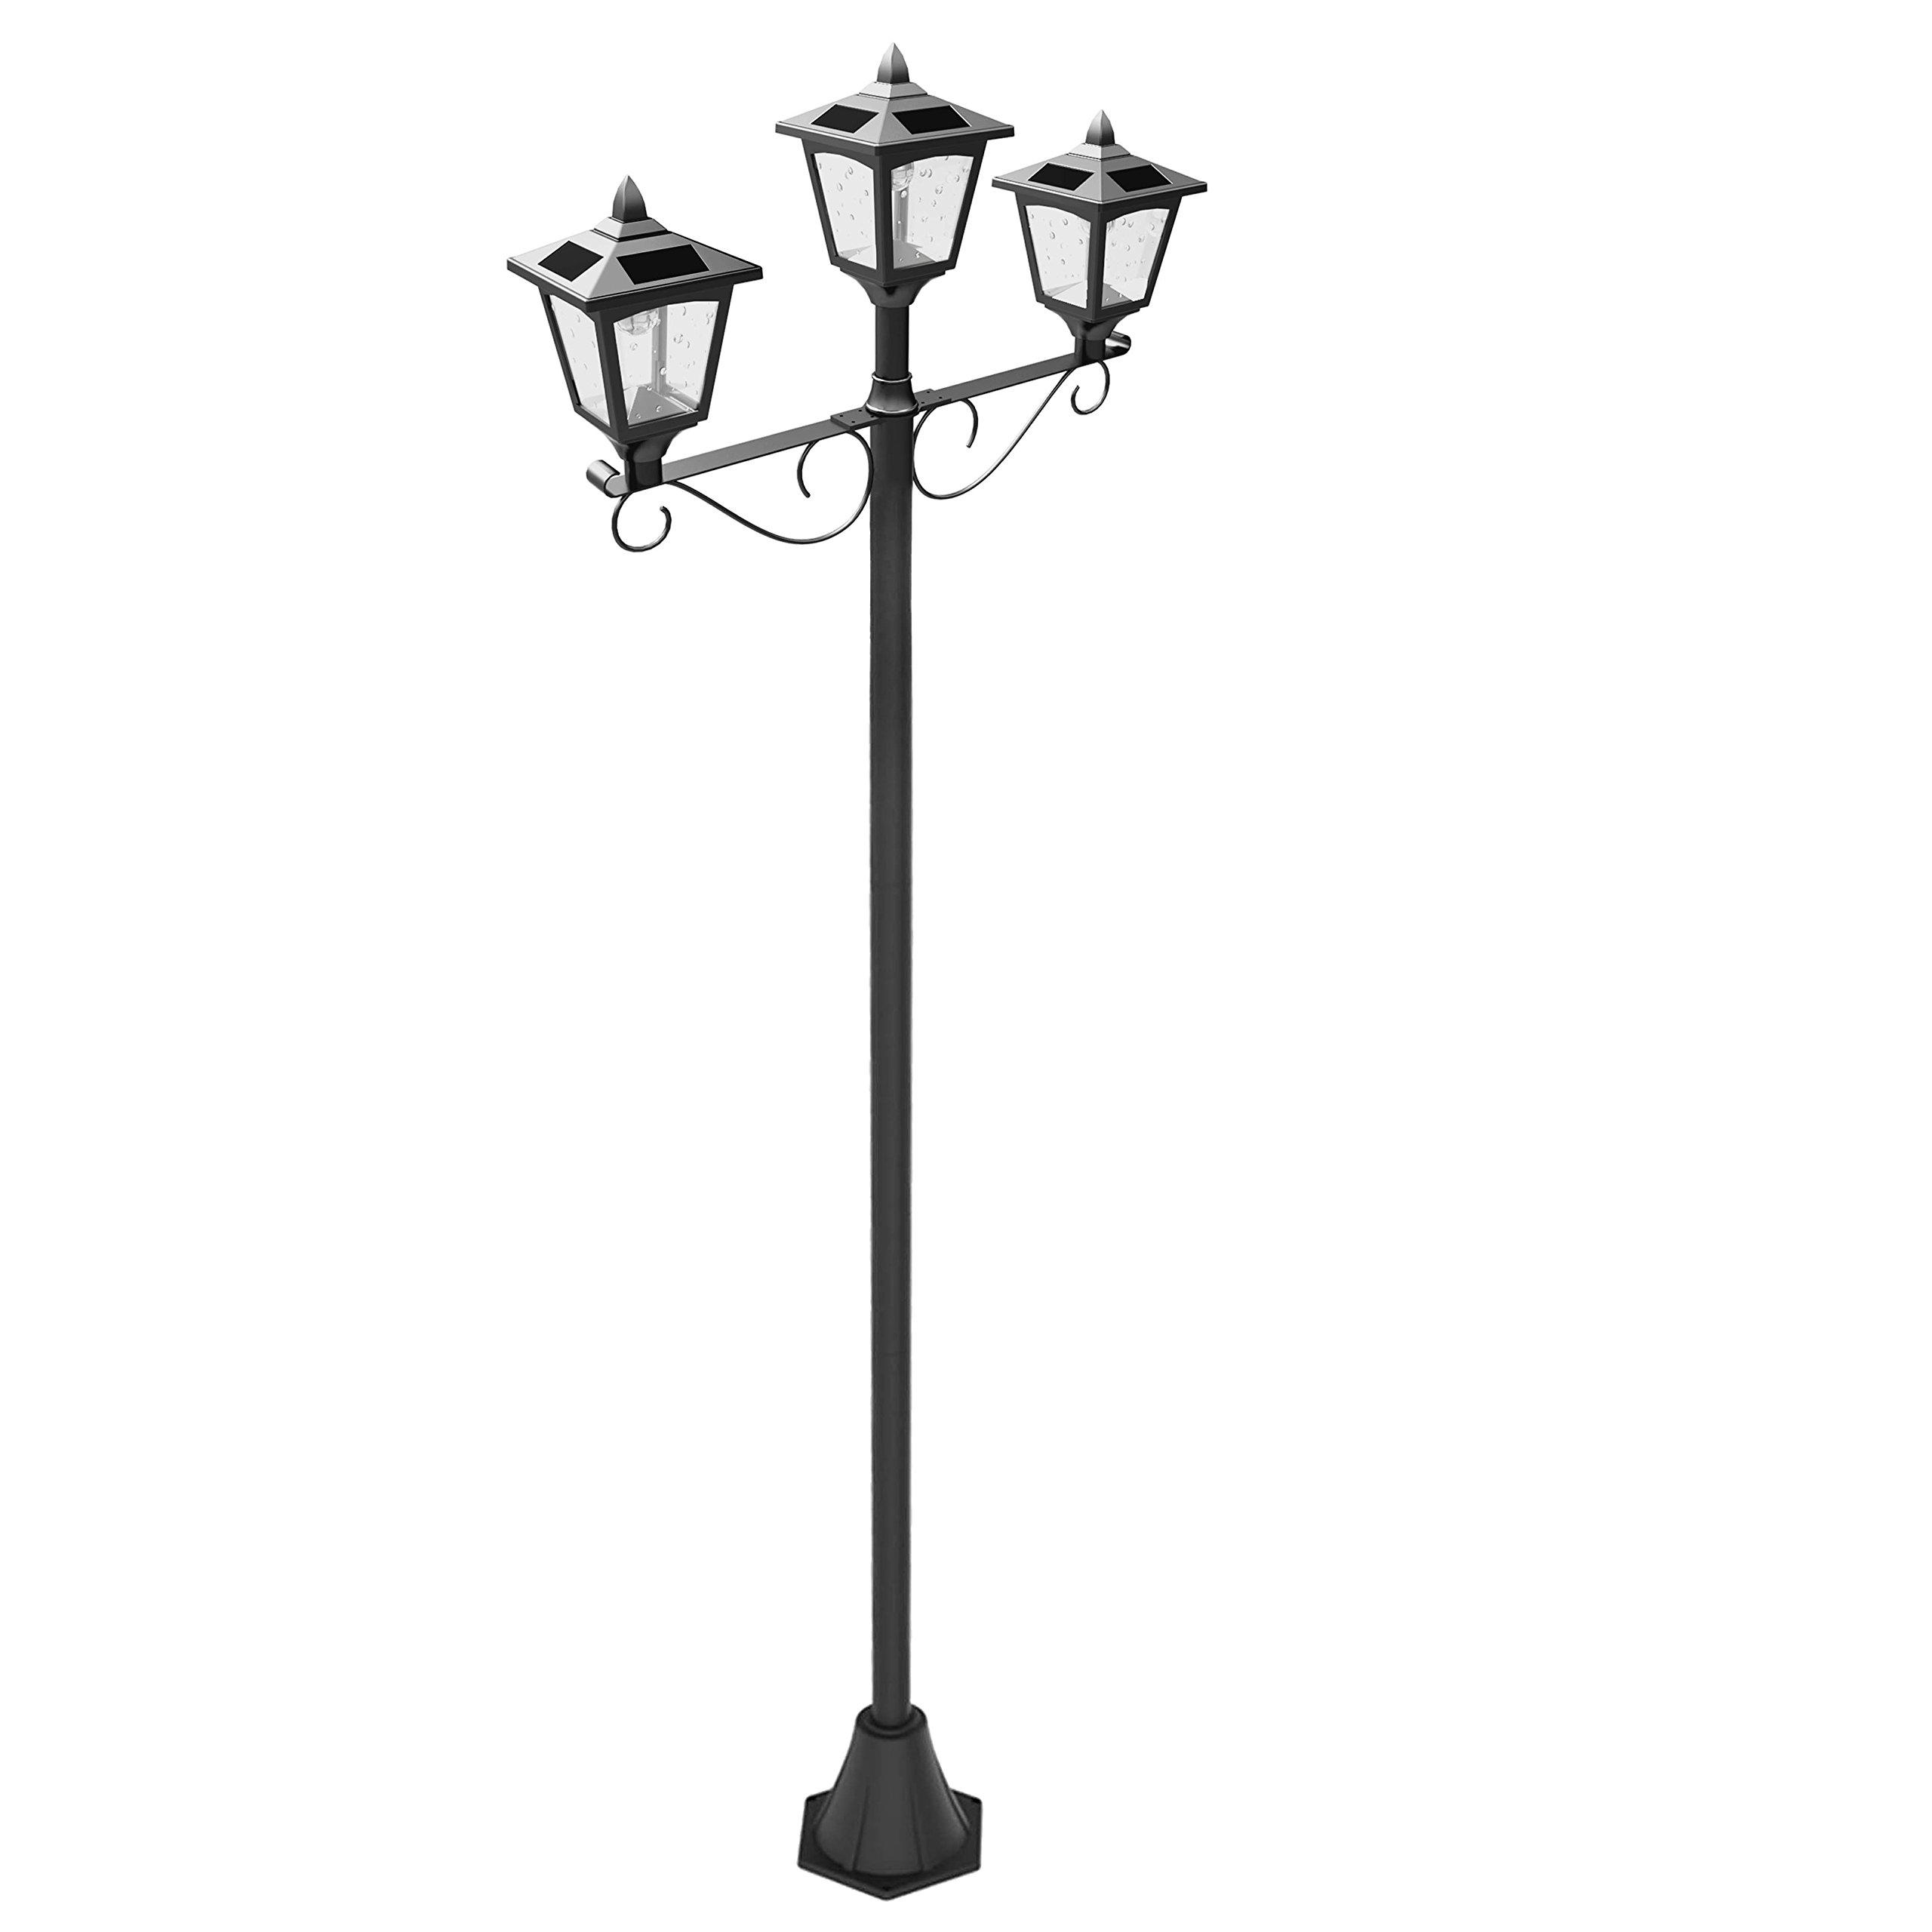 Cheap 3 Head Lamp Post Find Deals On Line At Sunny Solar Light Gardensolar Yard Lights Powered Lighting Get Quotations Upgrade 72 Triple Street Vintage Outdoor Garden